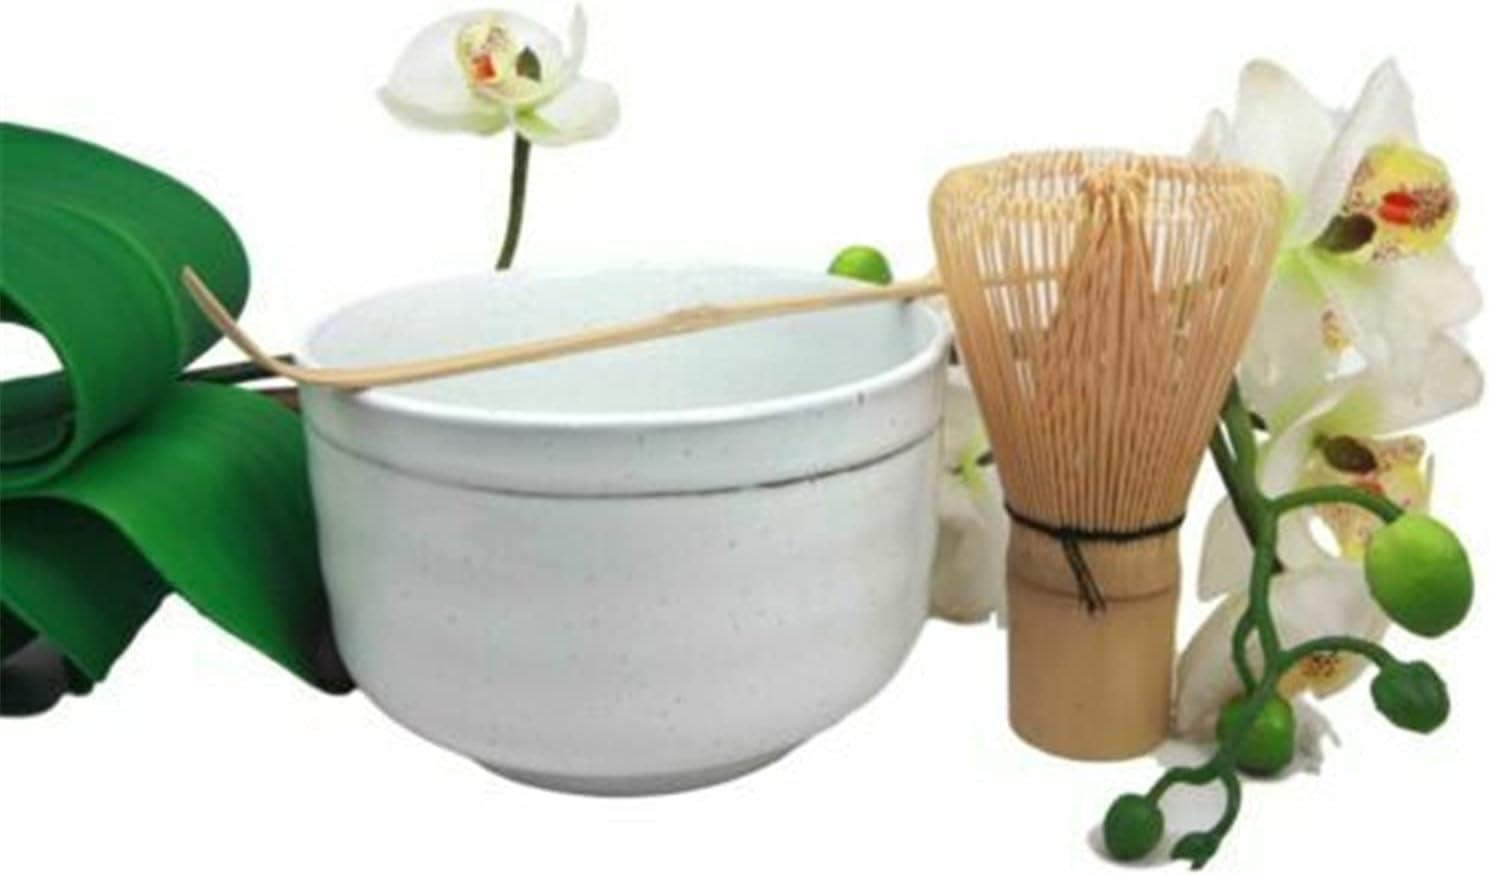 Veedaf Japanese Traditional Tea Ceremony Branded goods Set White w Matcha OFFer Bowl